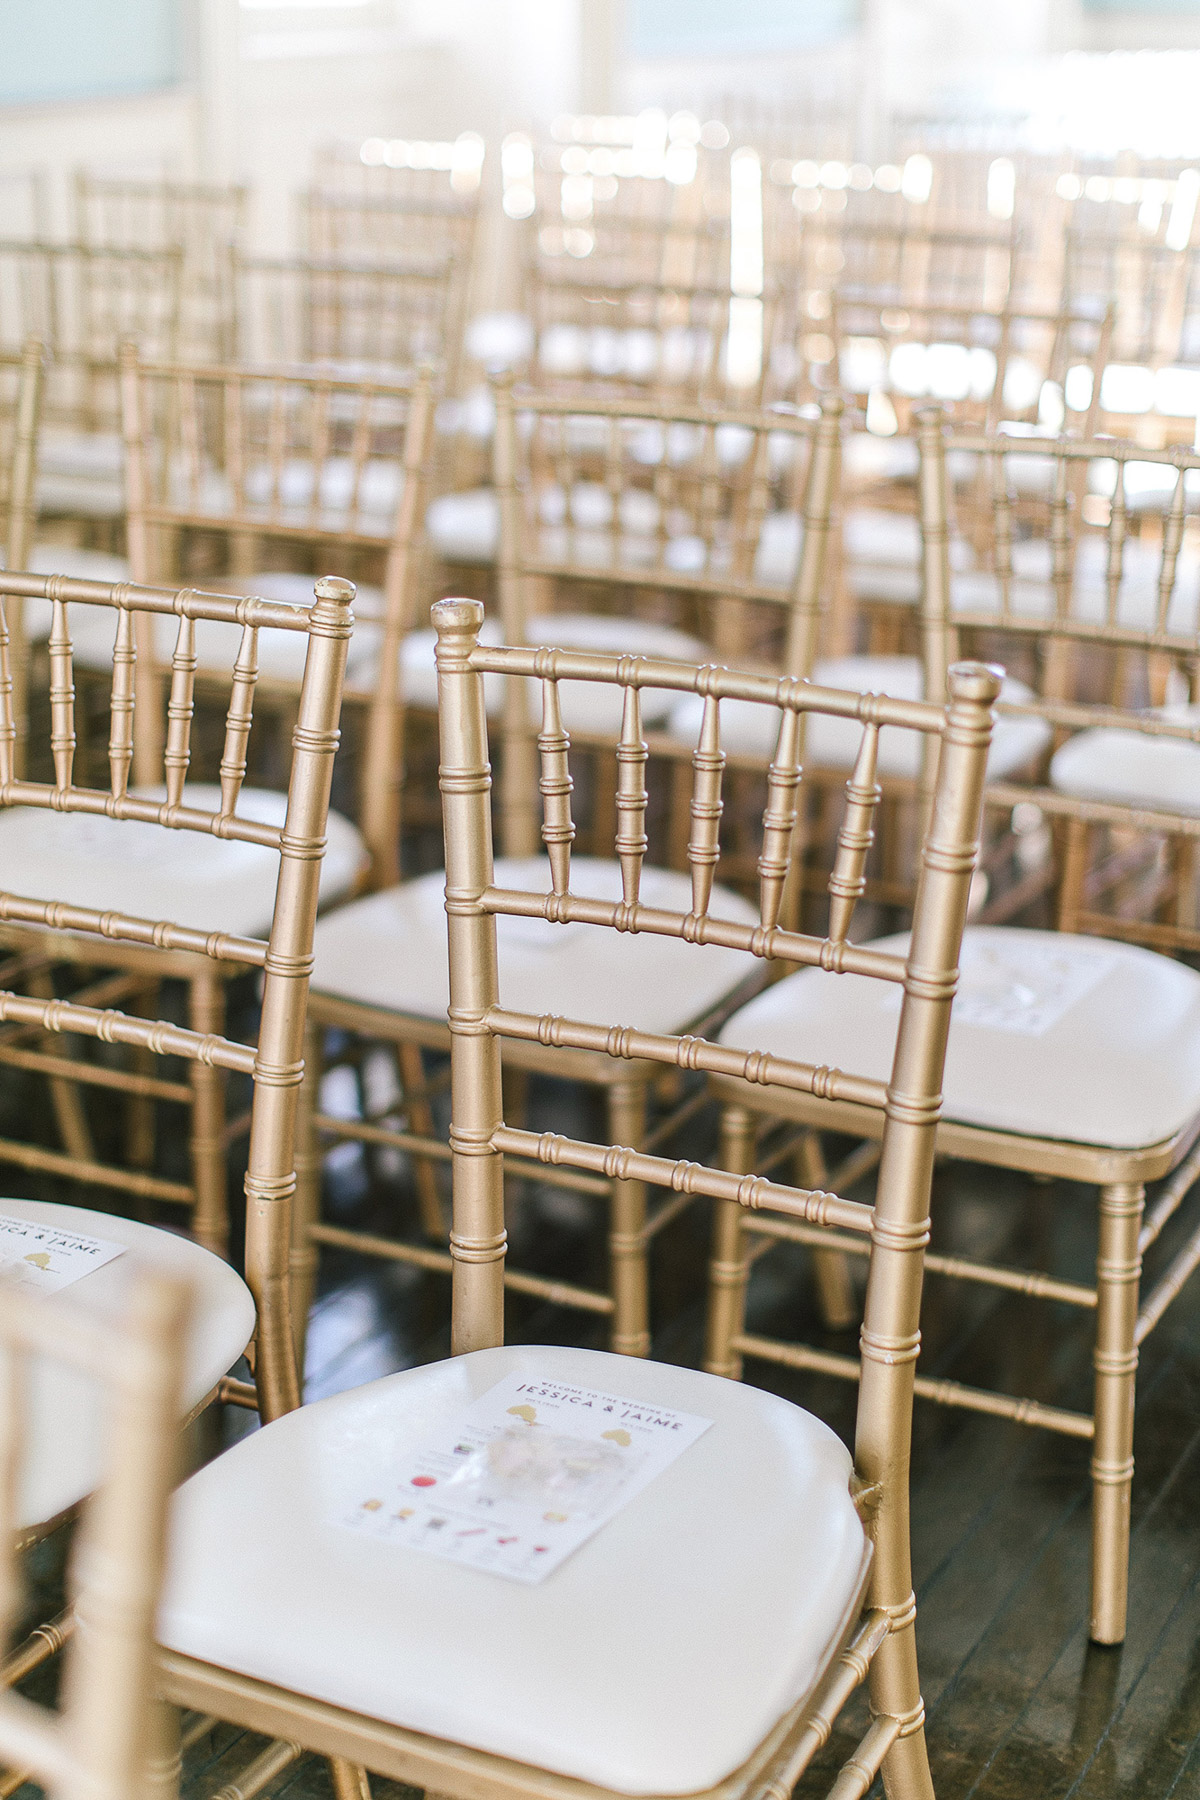 tamara-lockwood-photography-vineyard-bride-swish-list-the-old-courthouse-niagara-on-the-lake-wedding-53.jpg